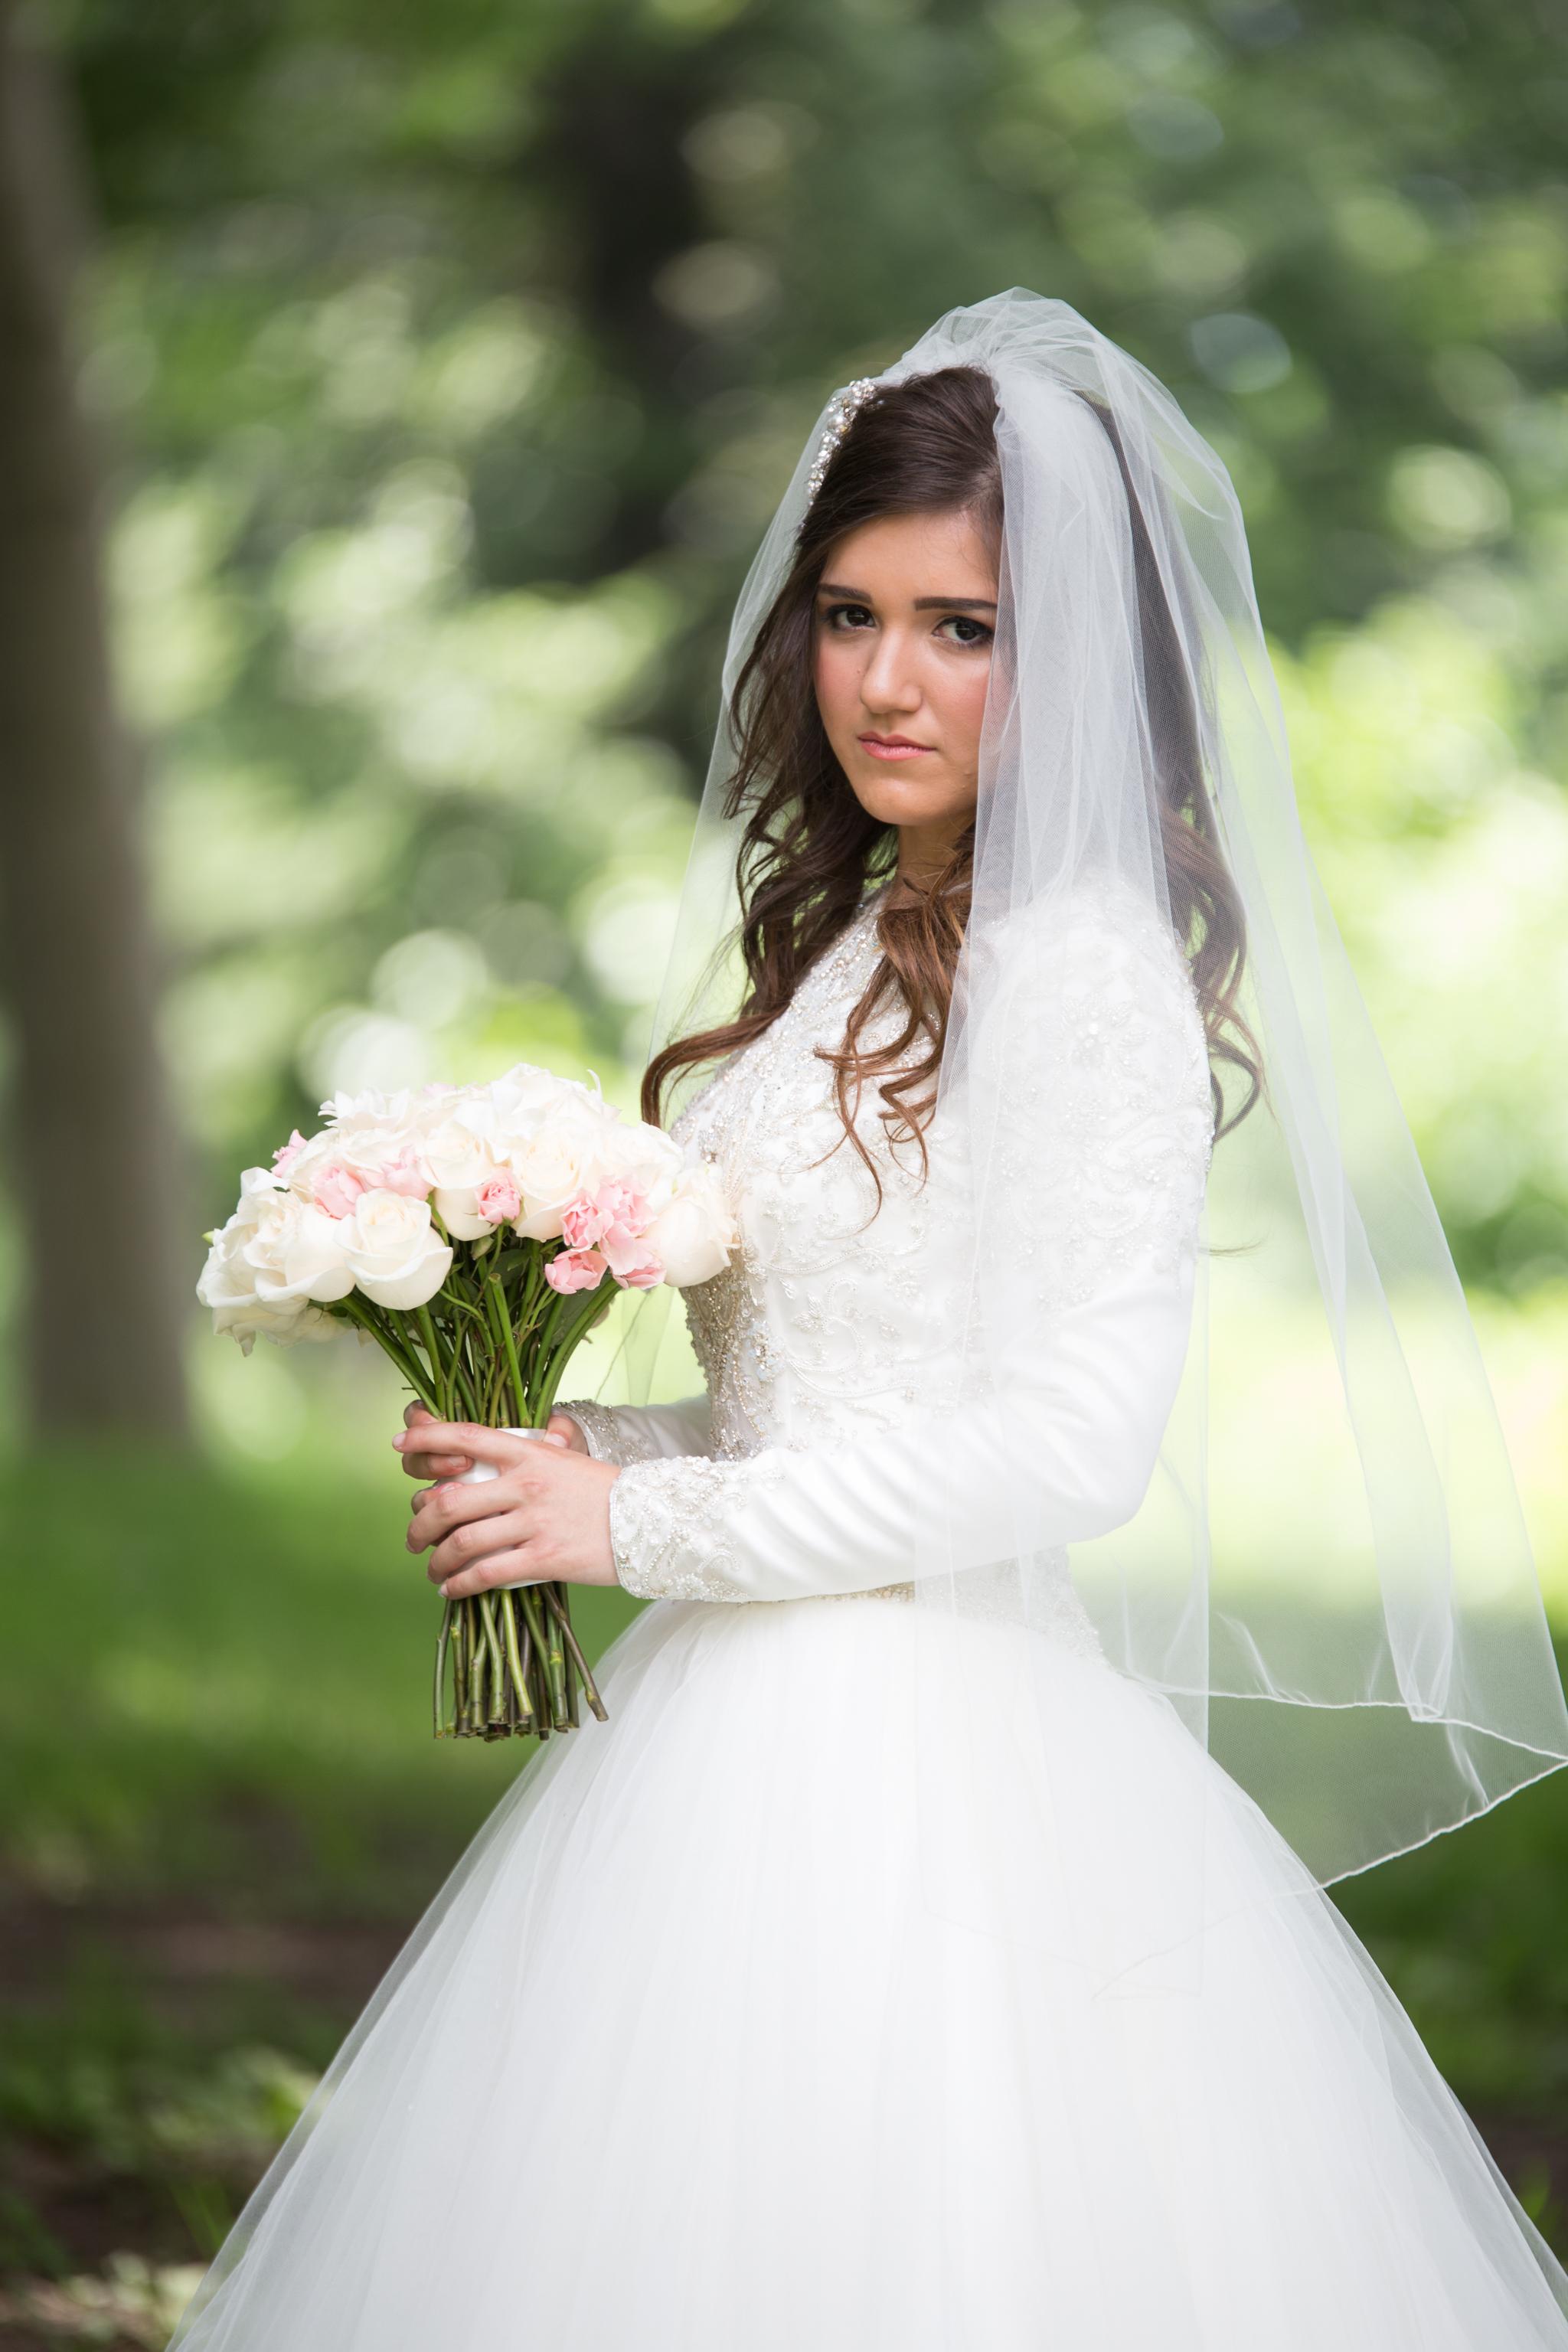 Wedding Iossi and Gitty Khafif  - Eliau Piha studio photography, new york, events, people 770 brooklyn -0082.jpg